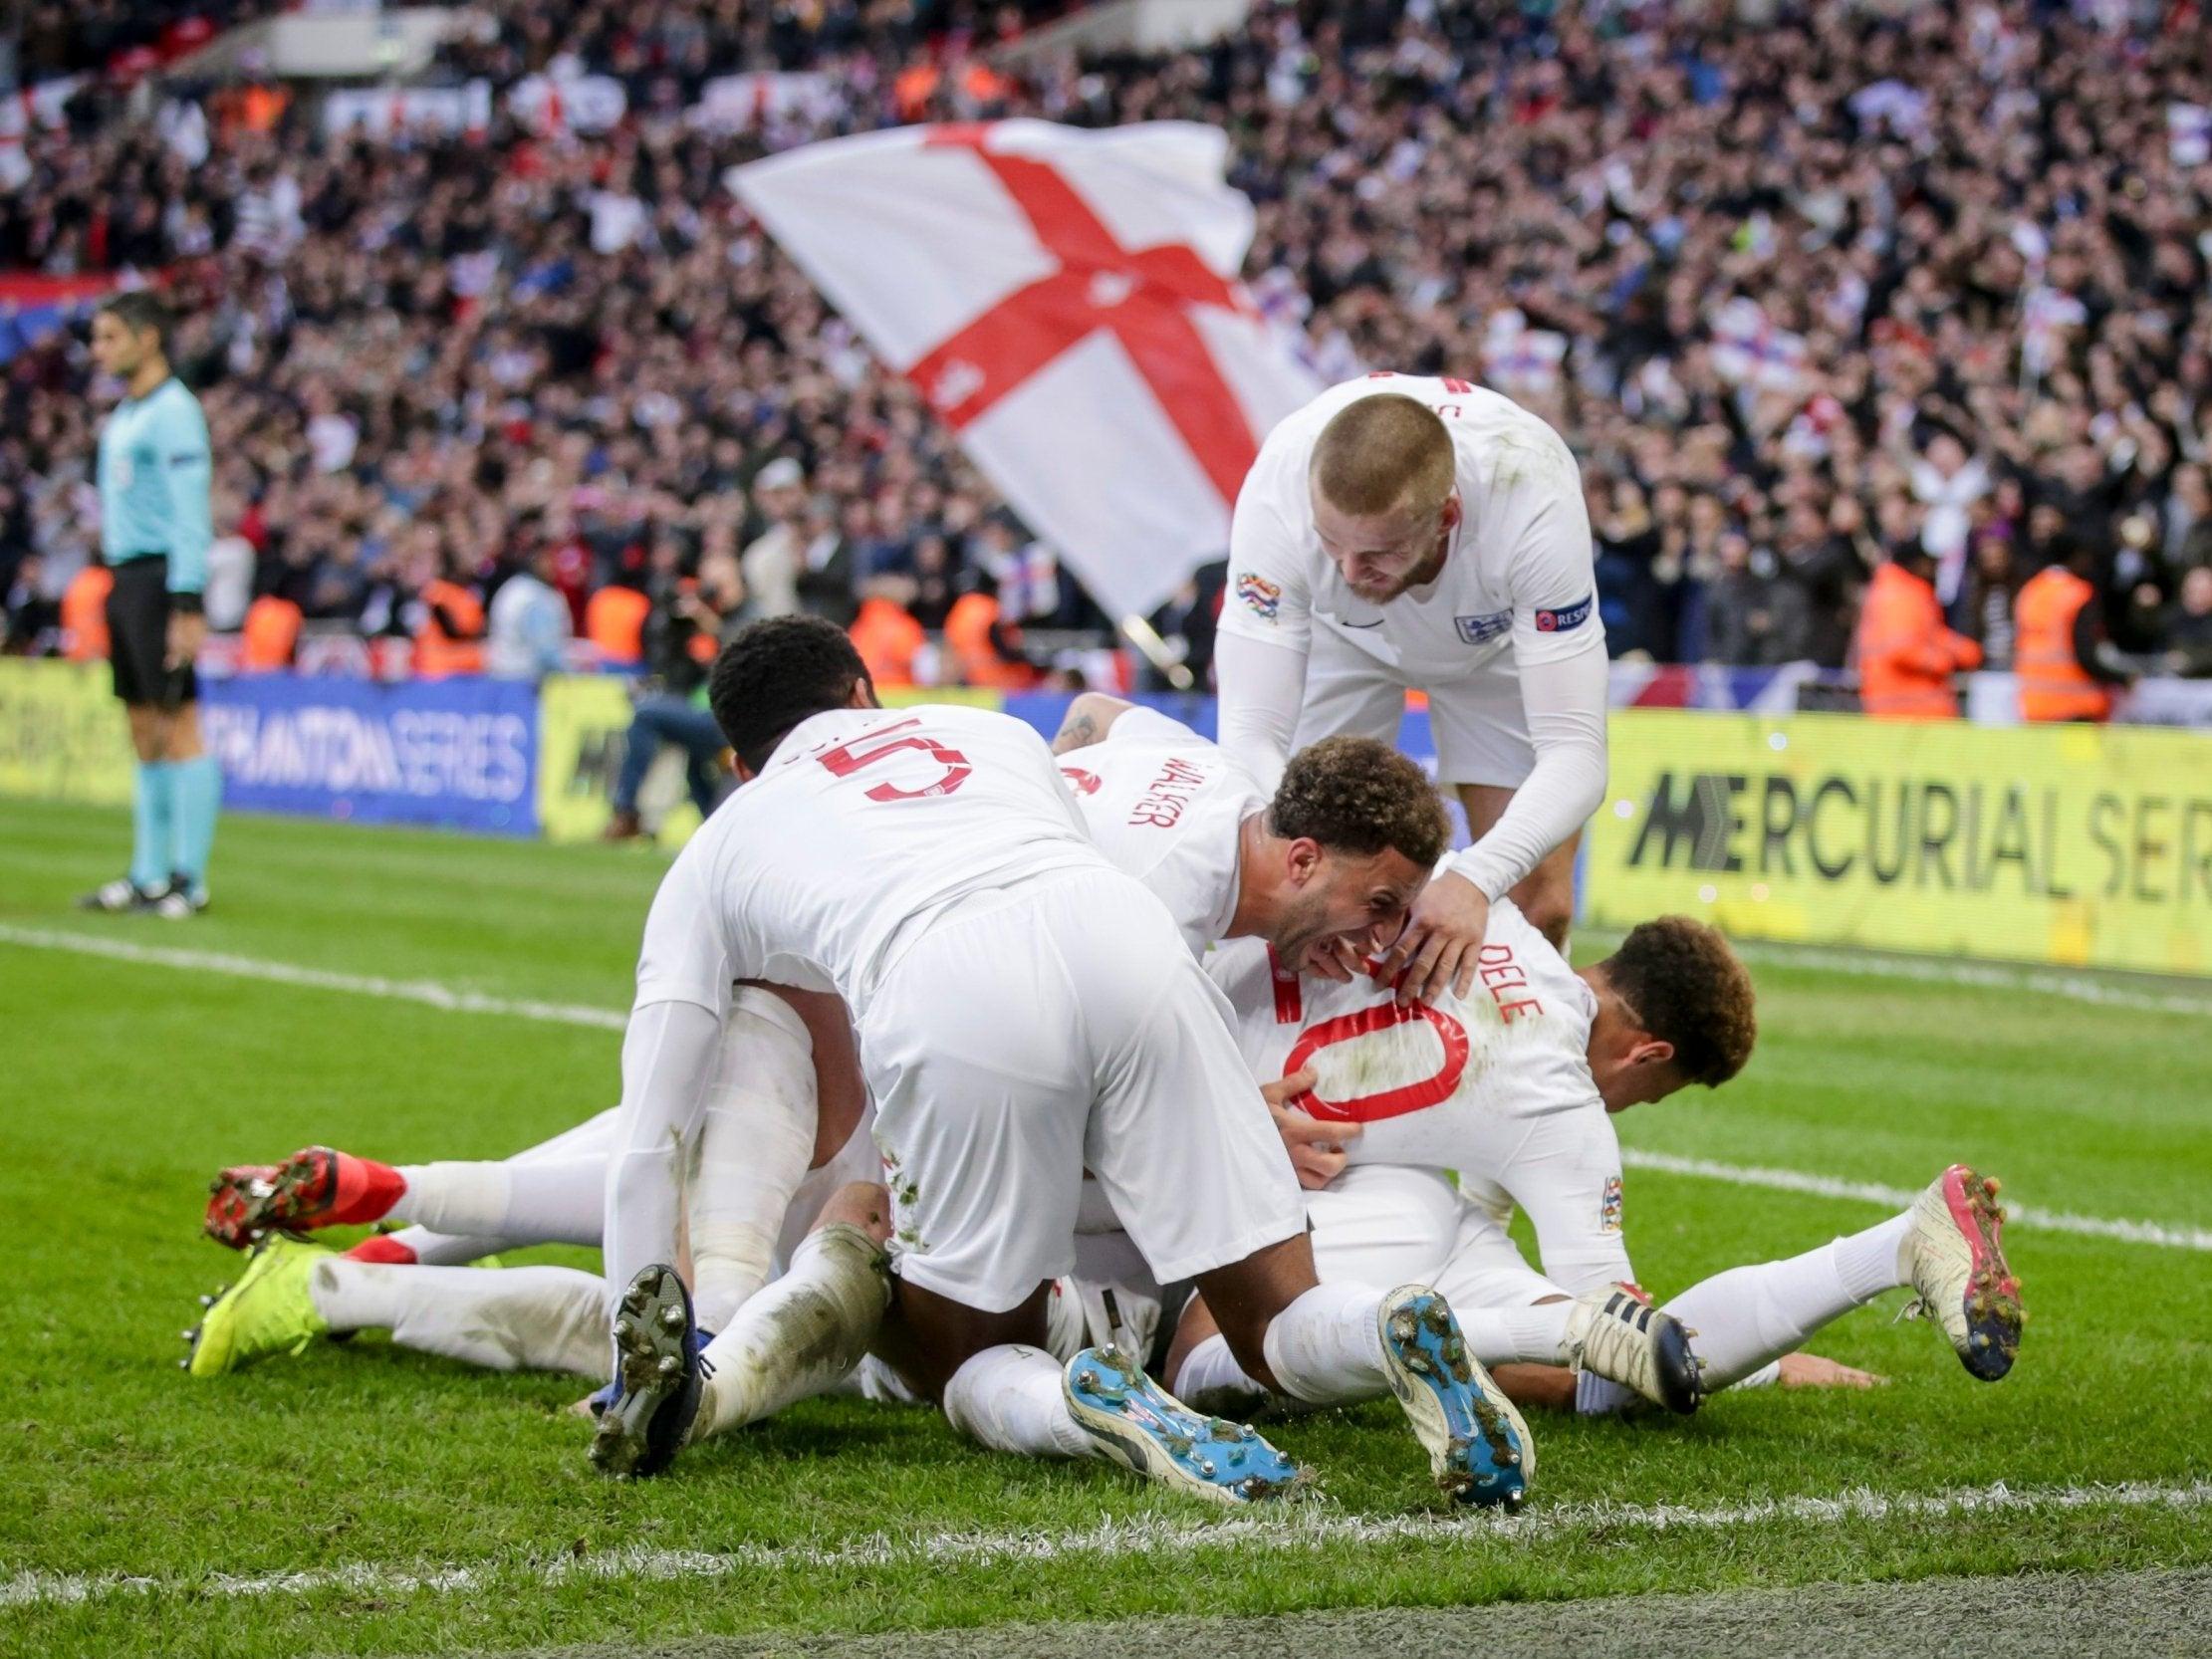 https://static.independent.co.uk/s3fs-public/thumbnails/image/2018/11/20/07/England-vs-Croatia-0.jpg